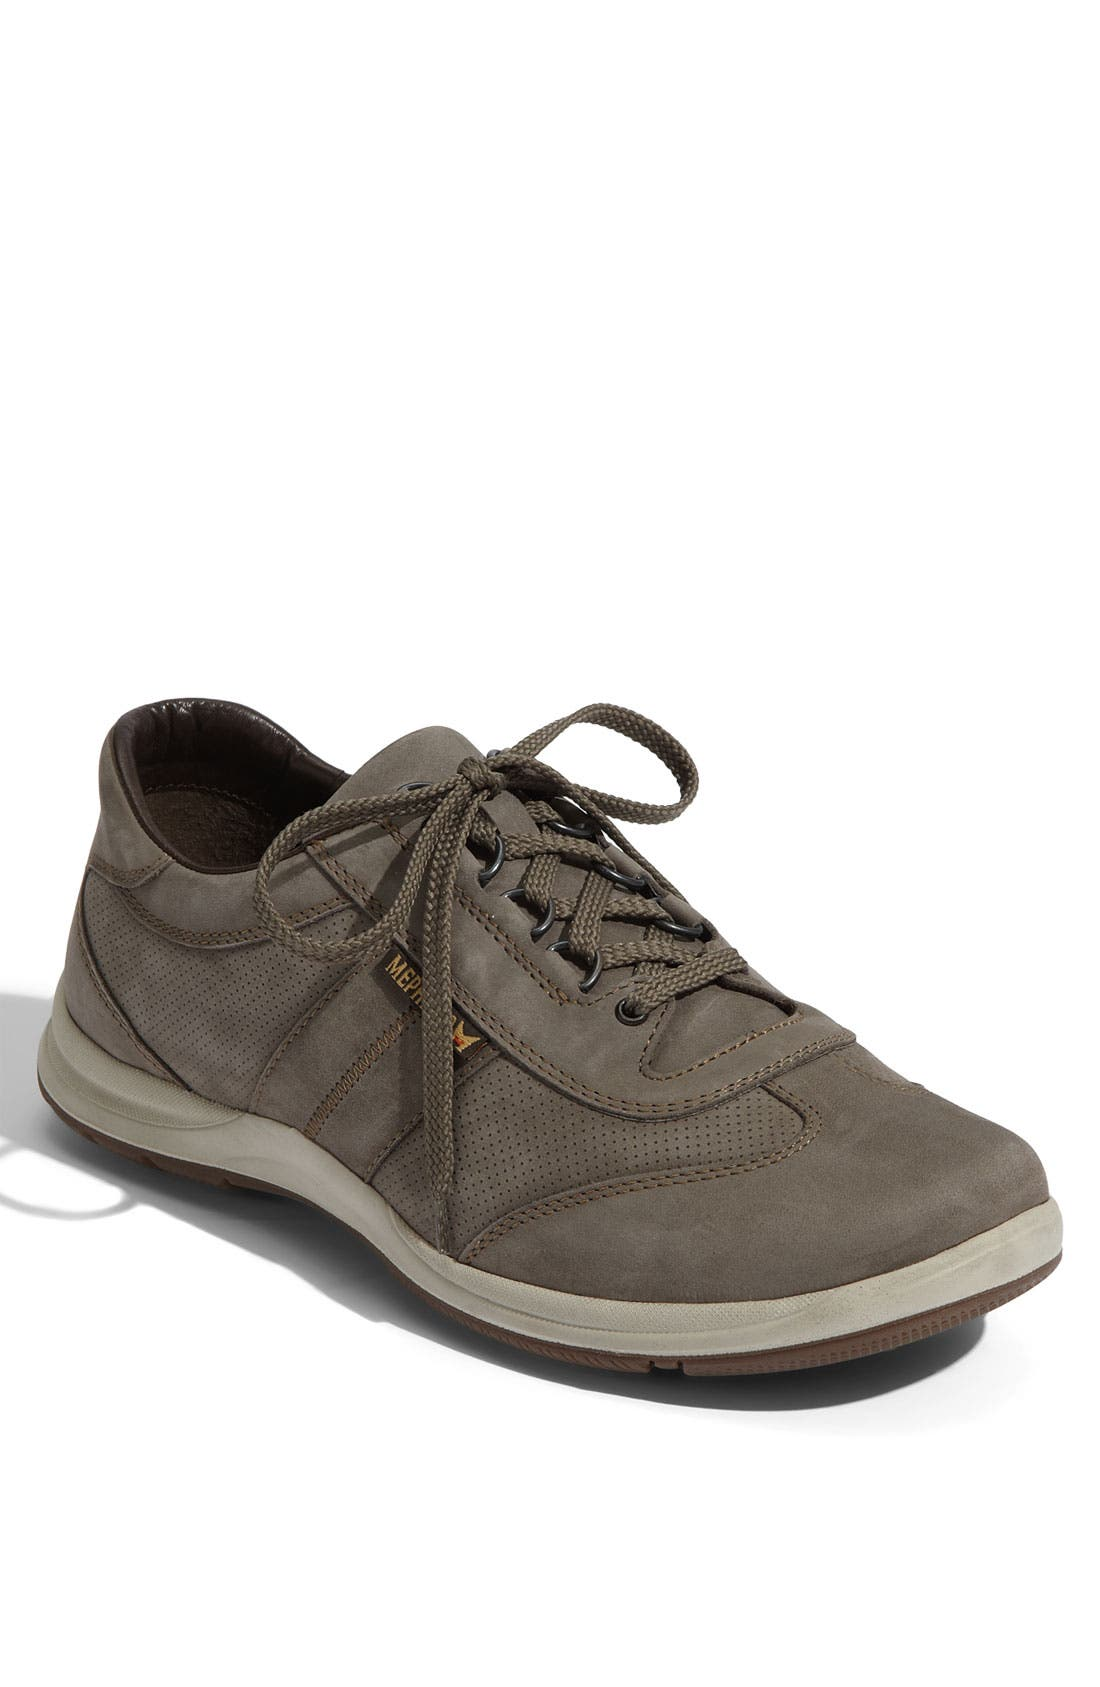 'Hike' Perforated Walking Shoe,                             Main thumbnail 1, color,                             020